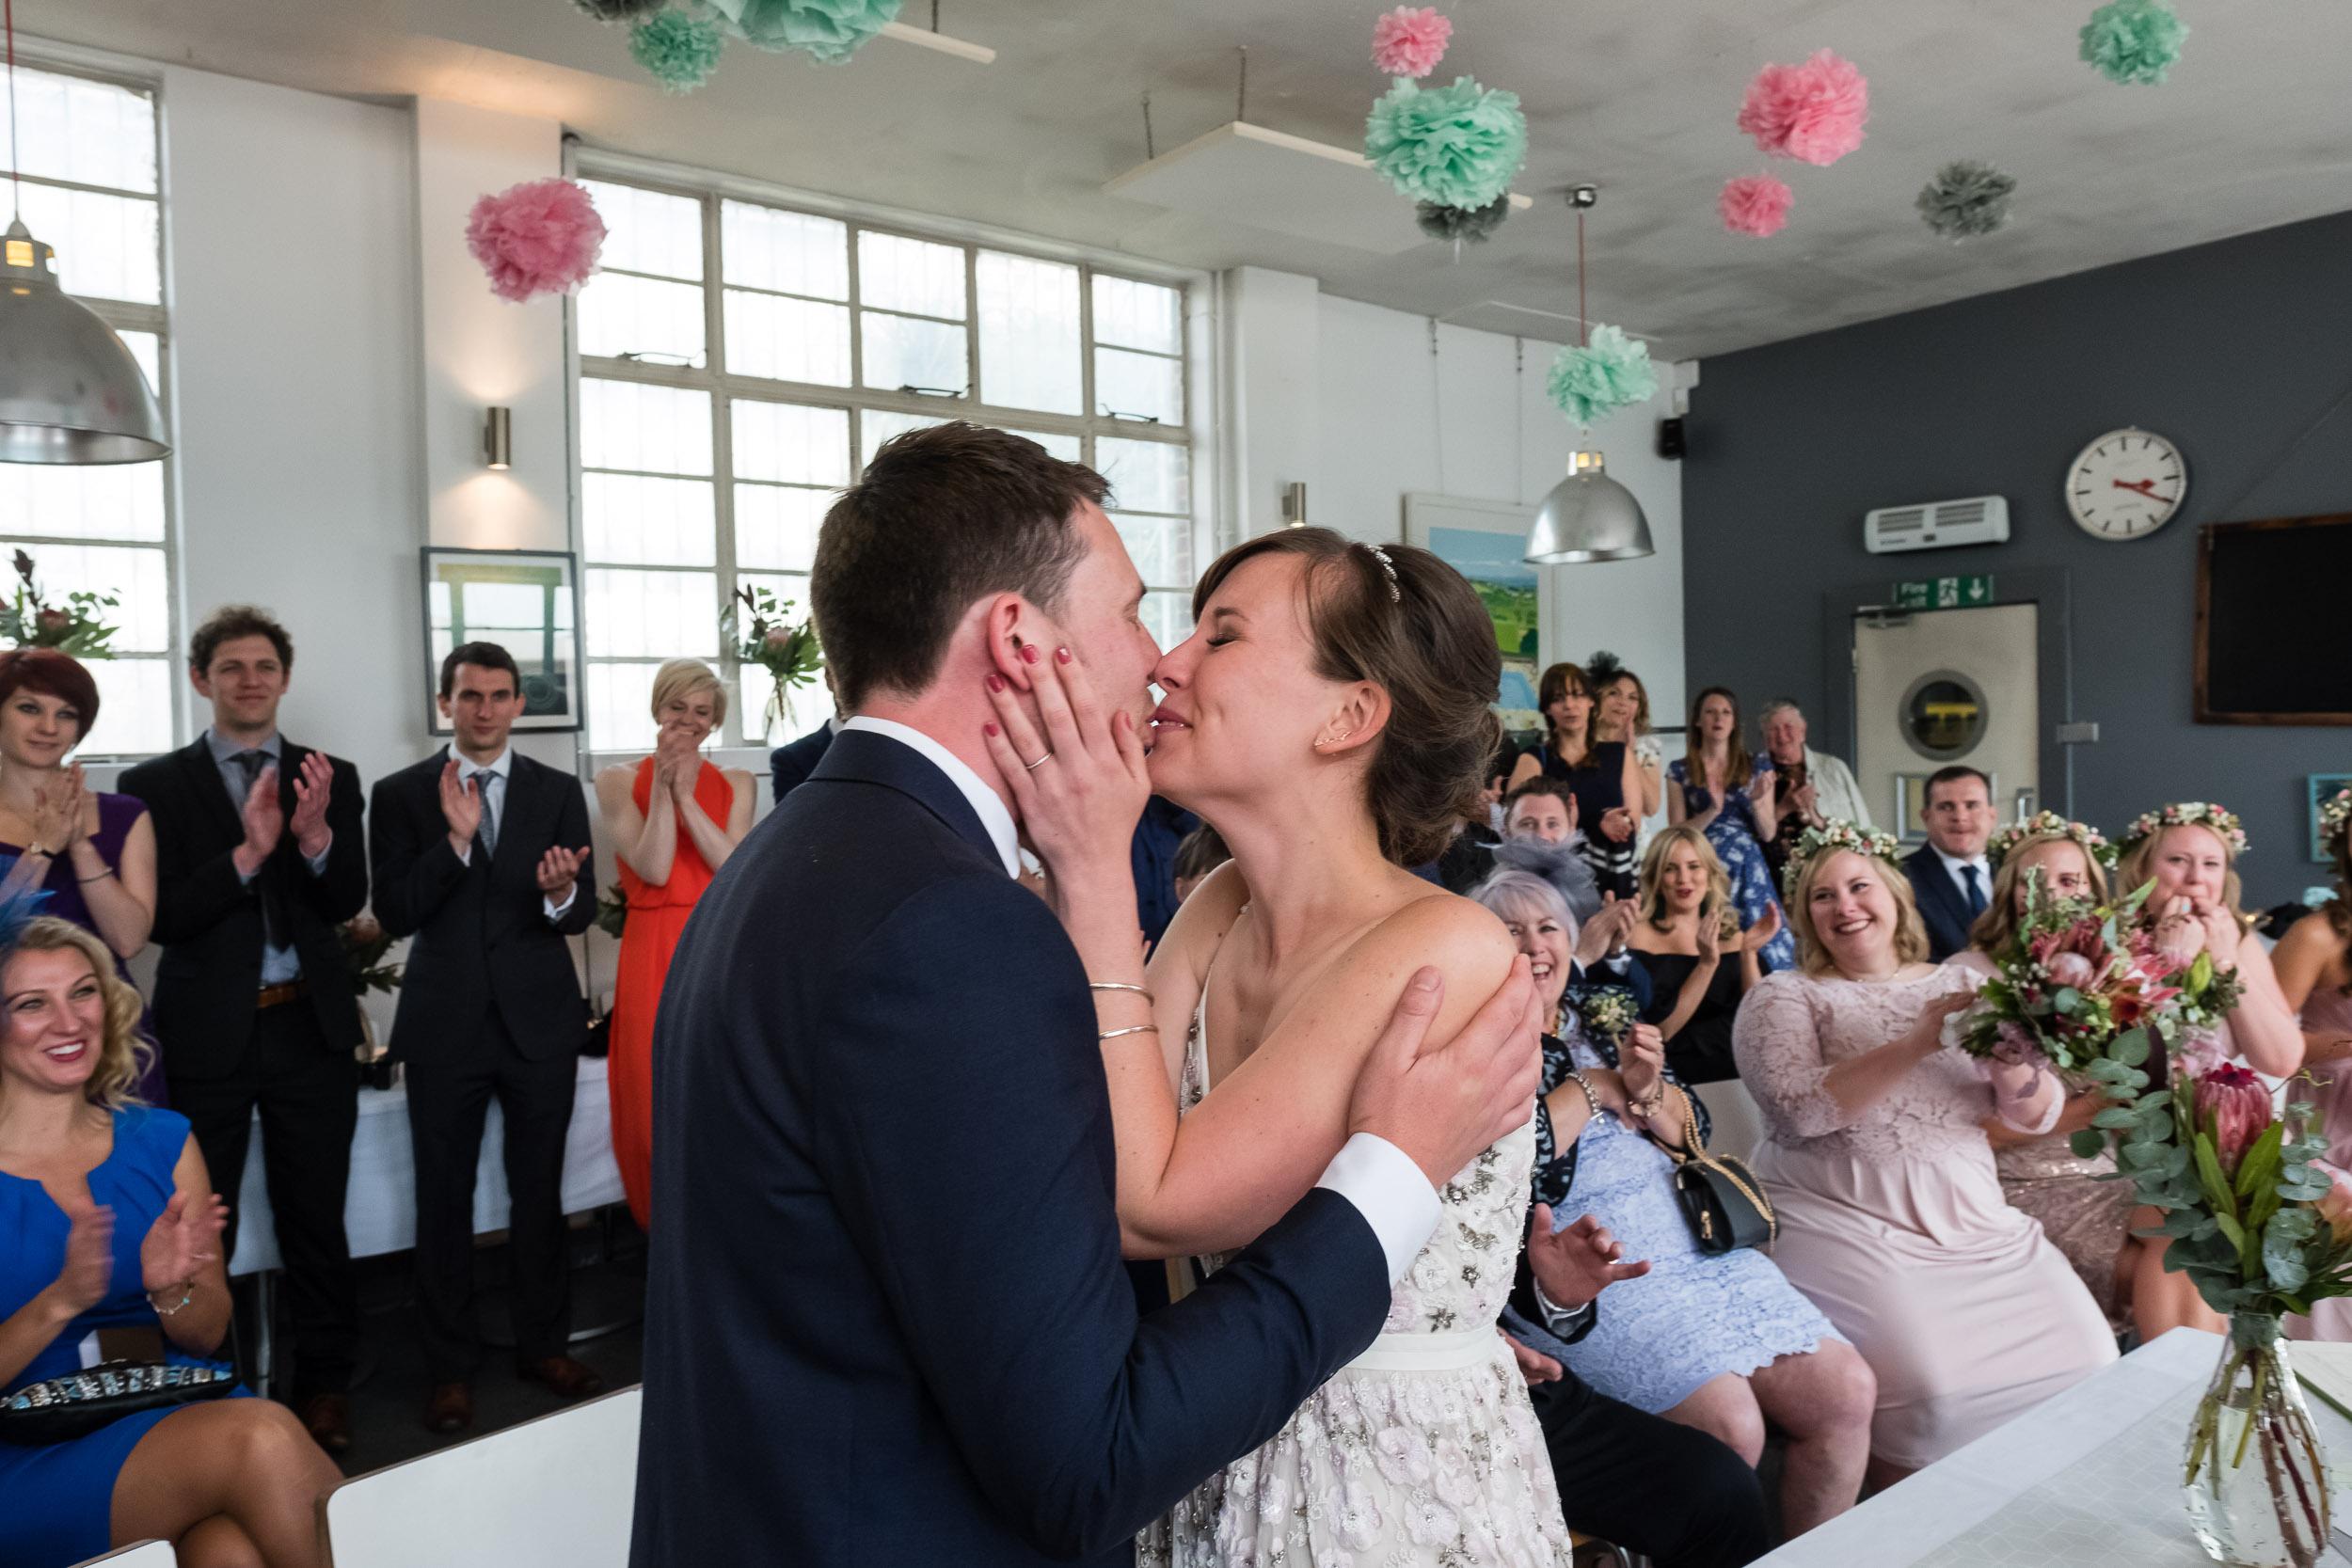 brockwell-lido-brixton-herne-hill-wedding-182.jpg